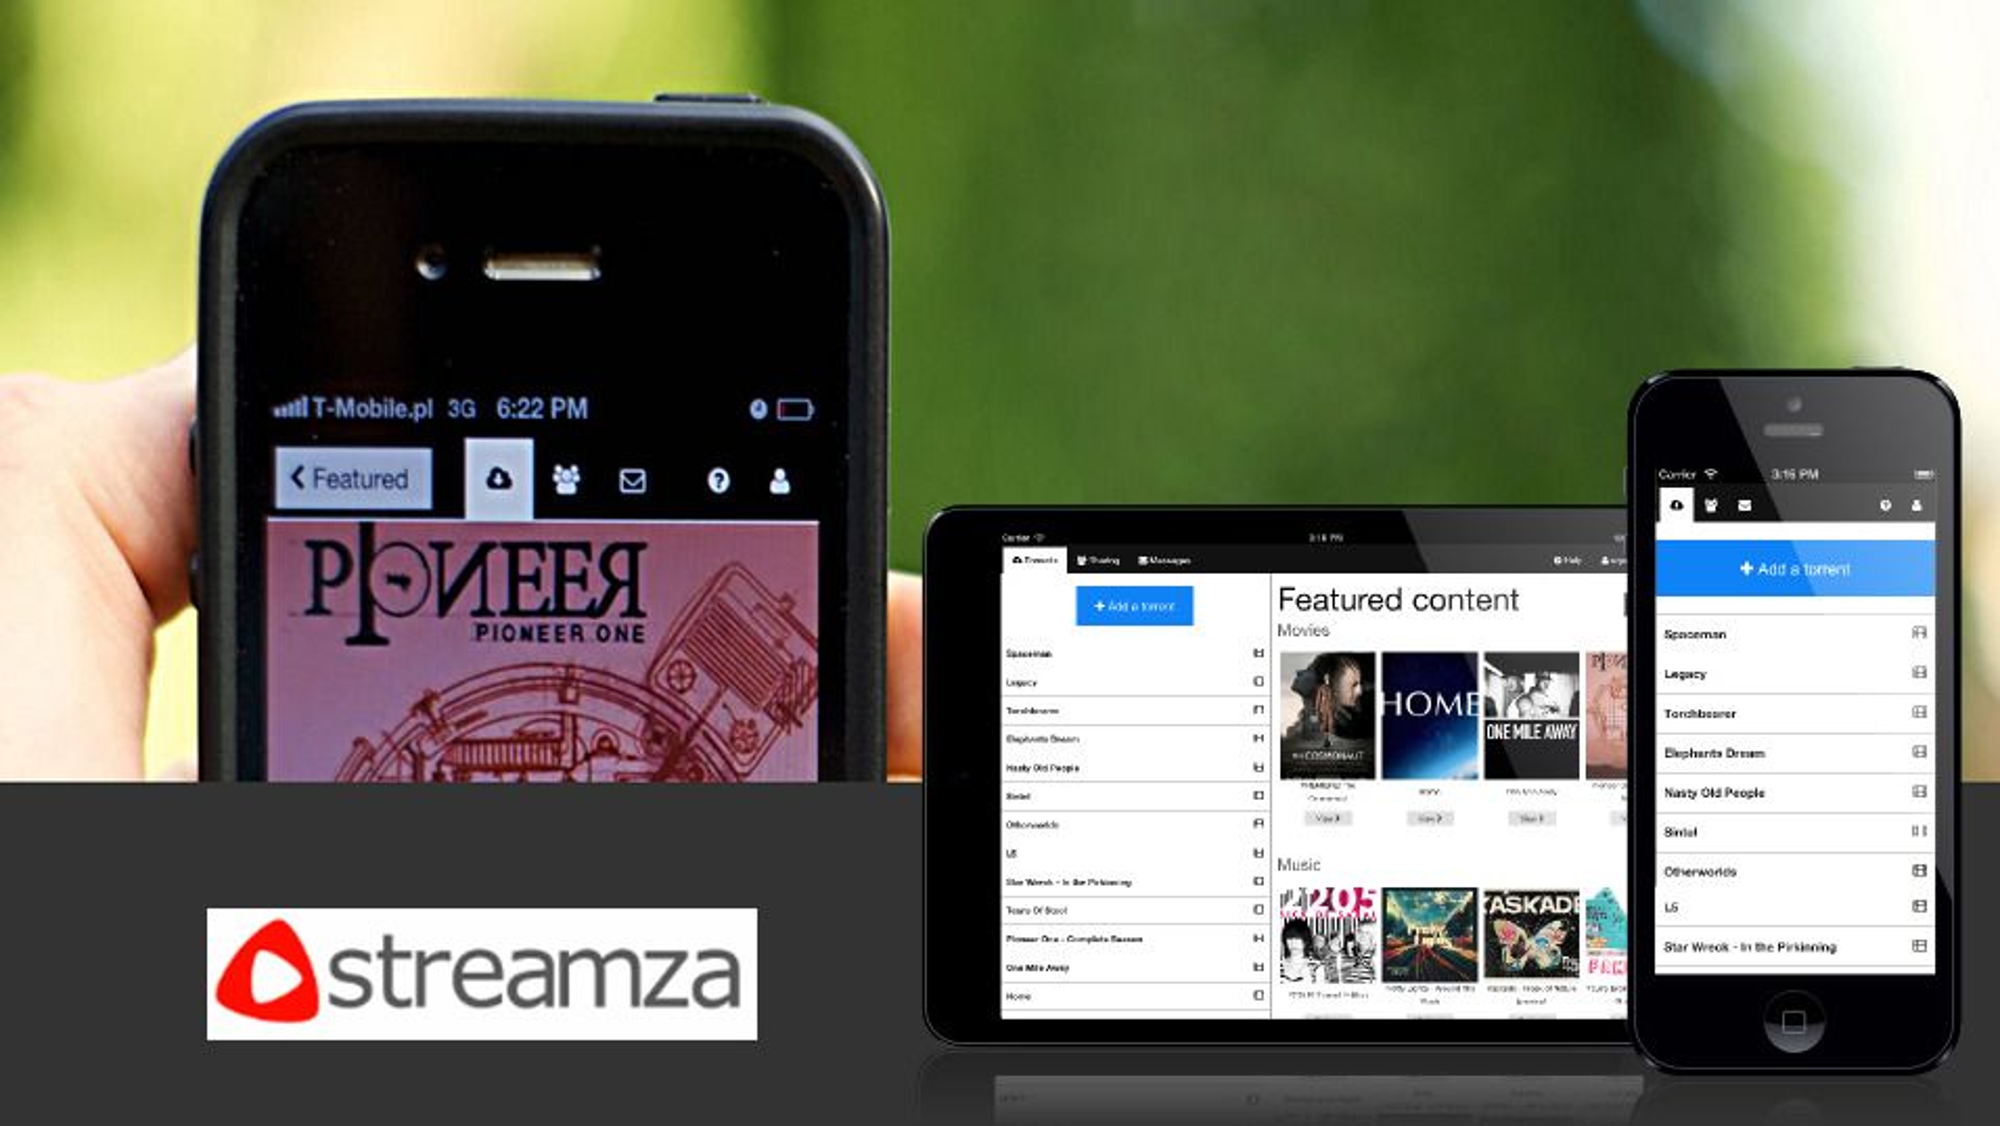 Strøm torrent-innhold trådløst til flere enheter med Streamza